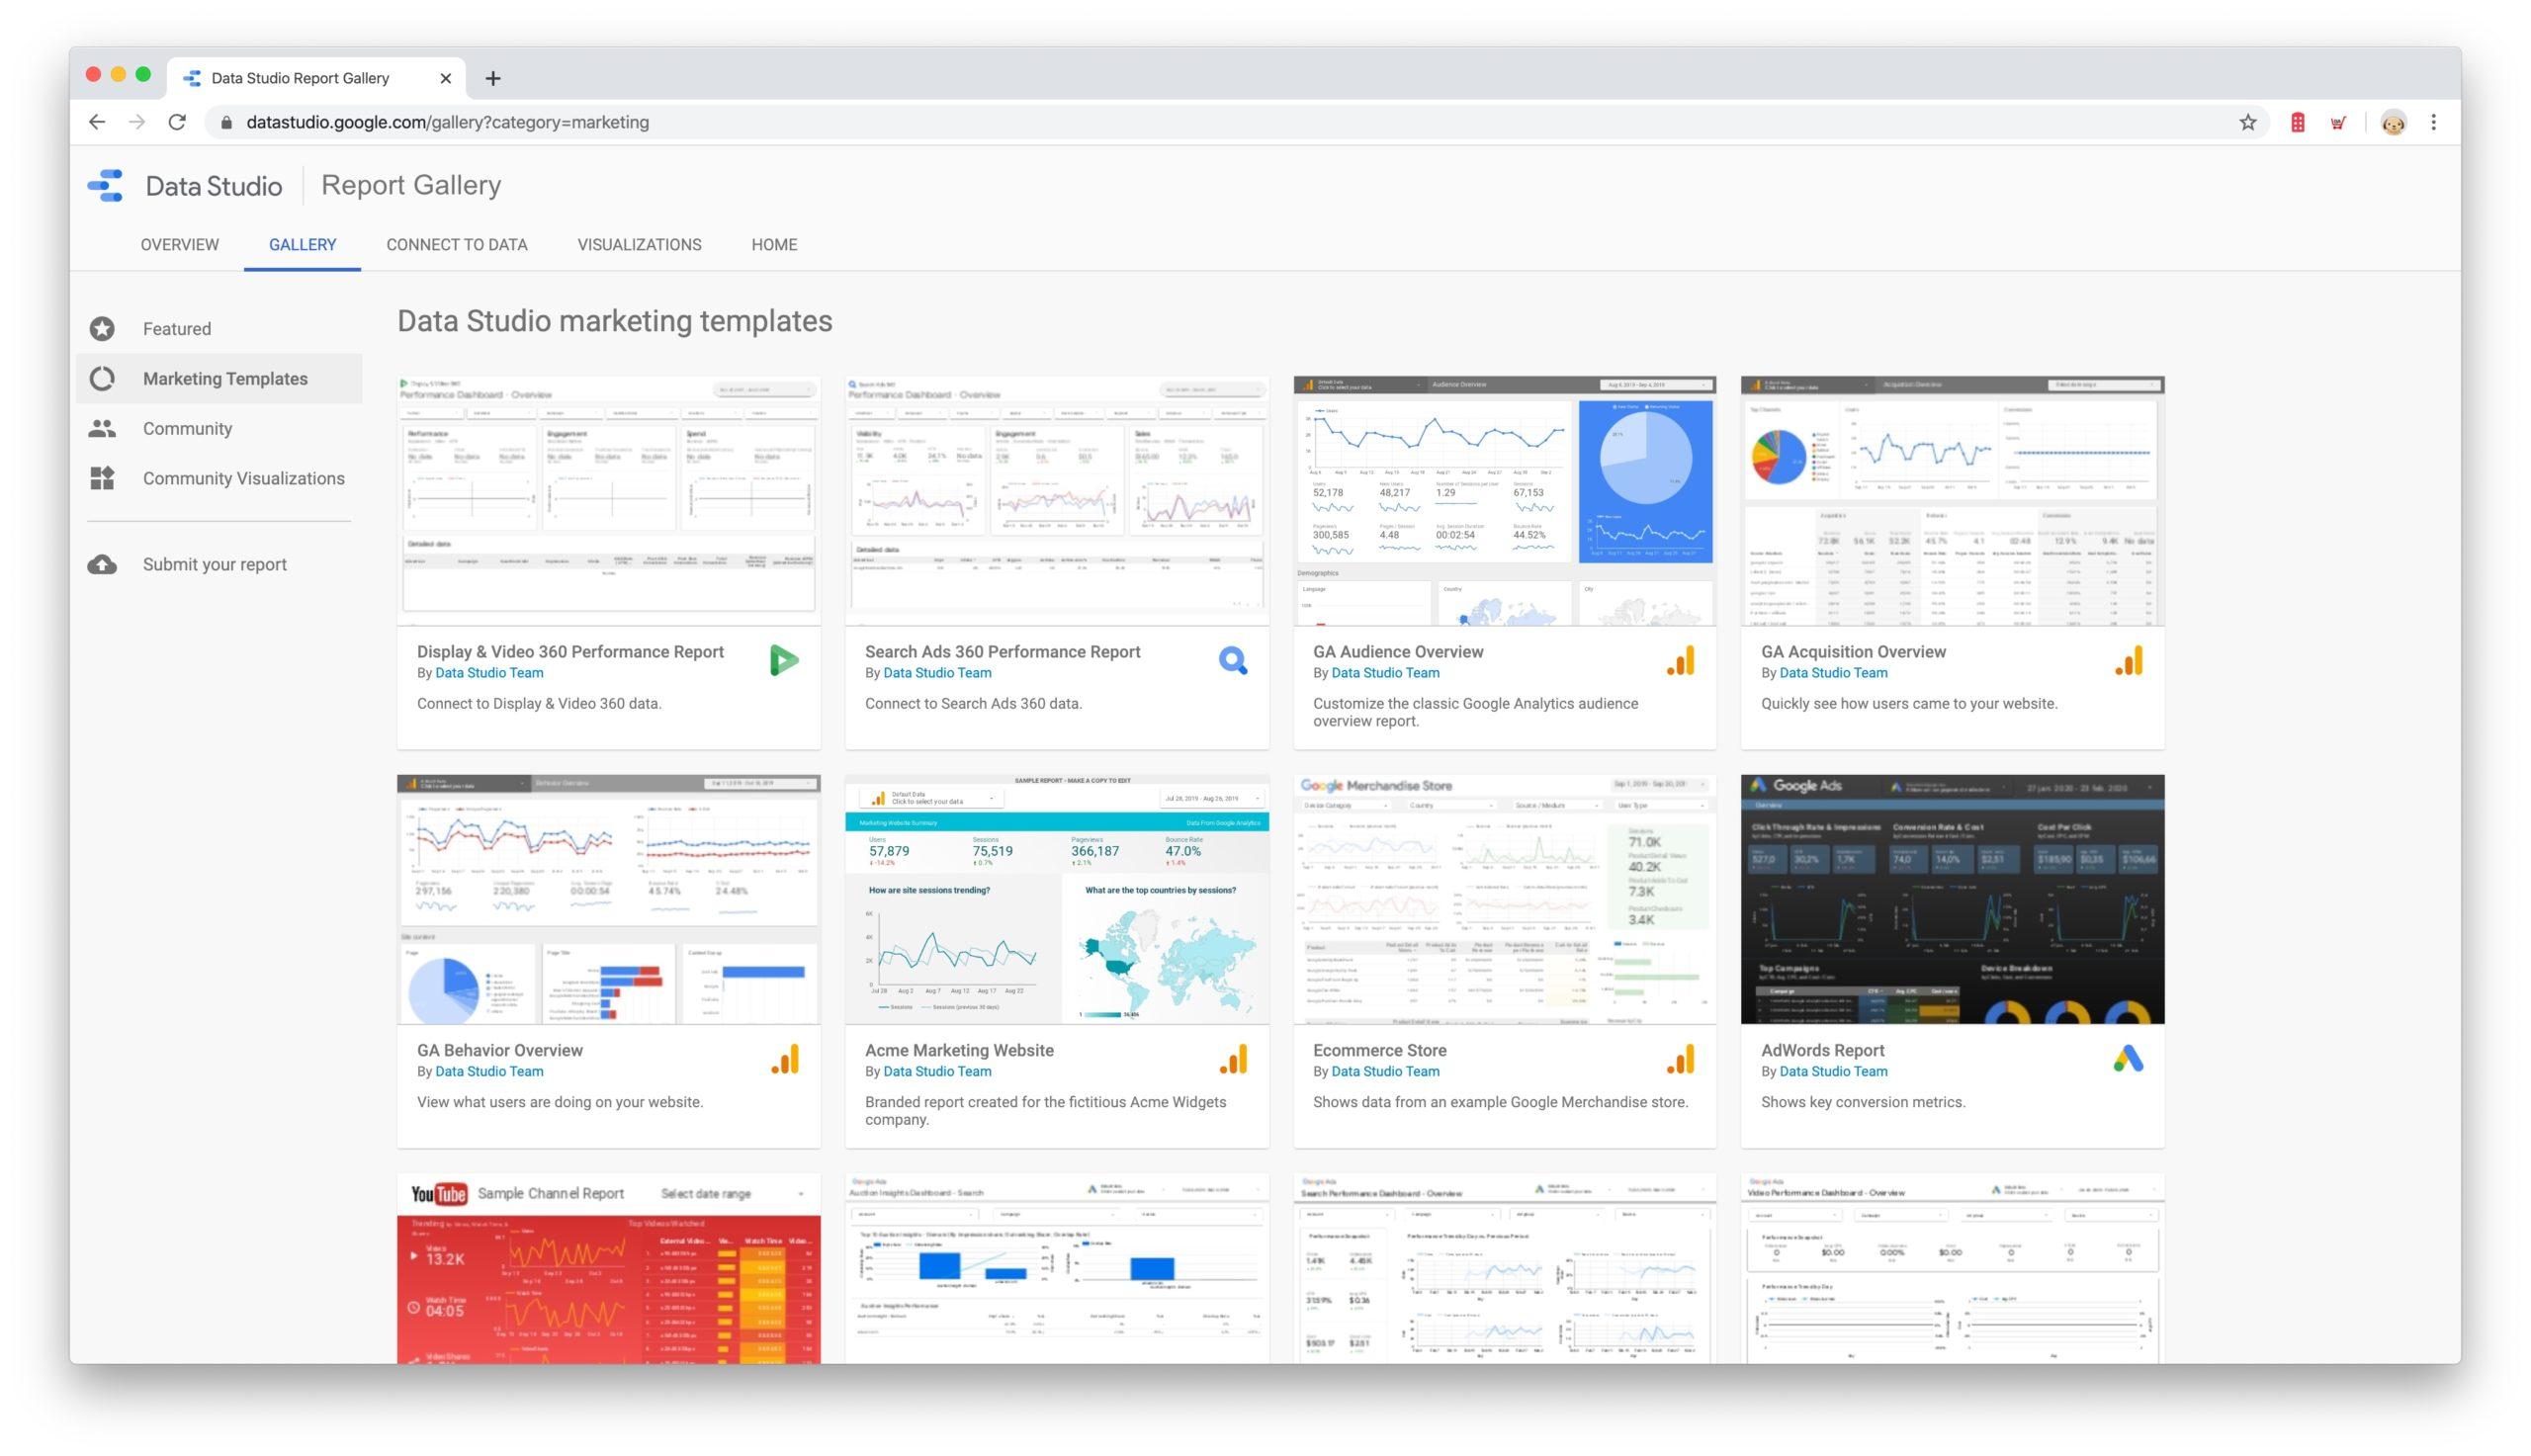 Data Studio report gallery